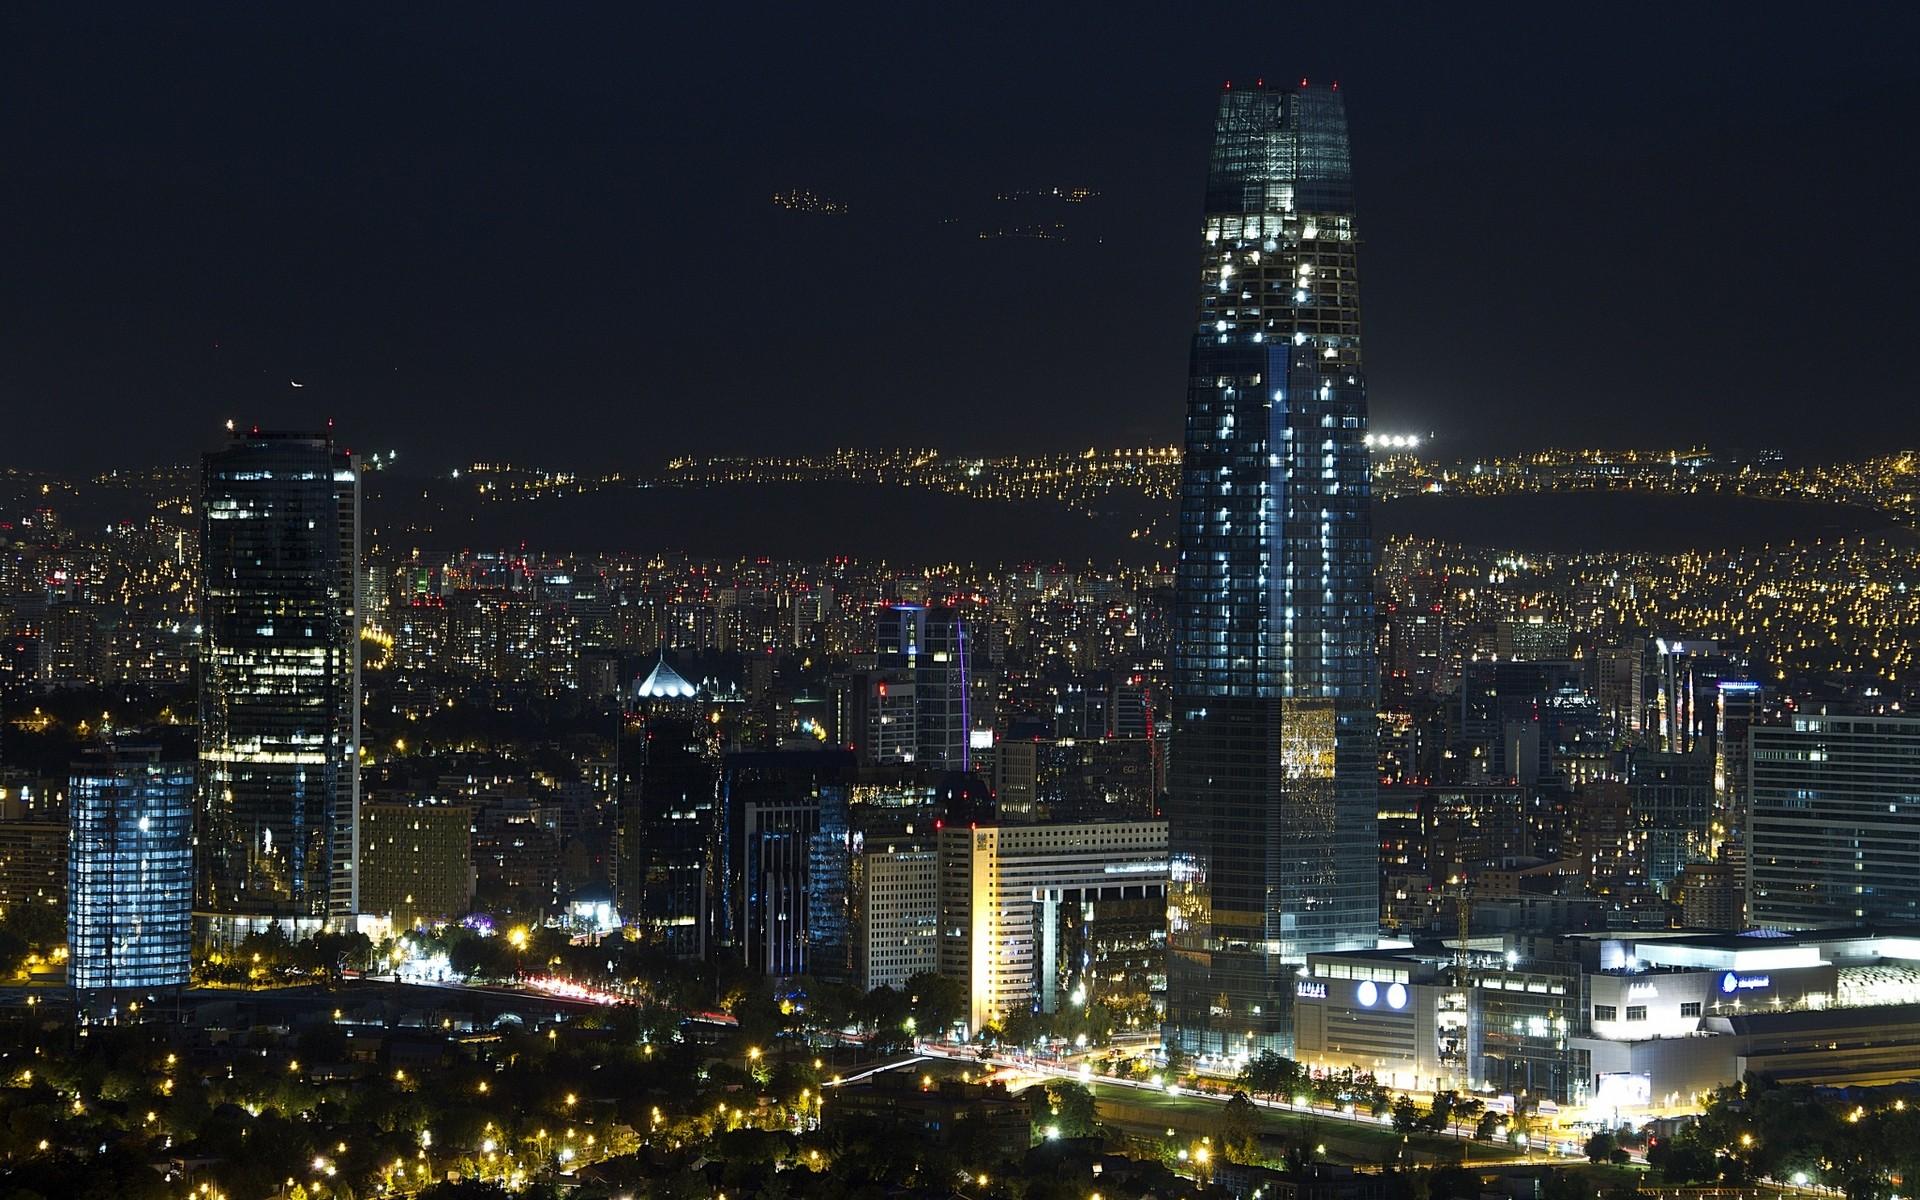 General 1920x1200 landscape lights Santiago de Chile cityscape night skyscraper metropolis  modern urban building architecture